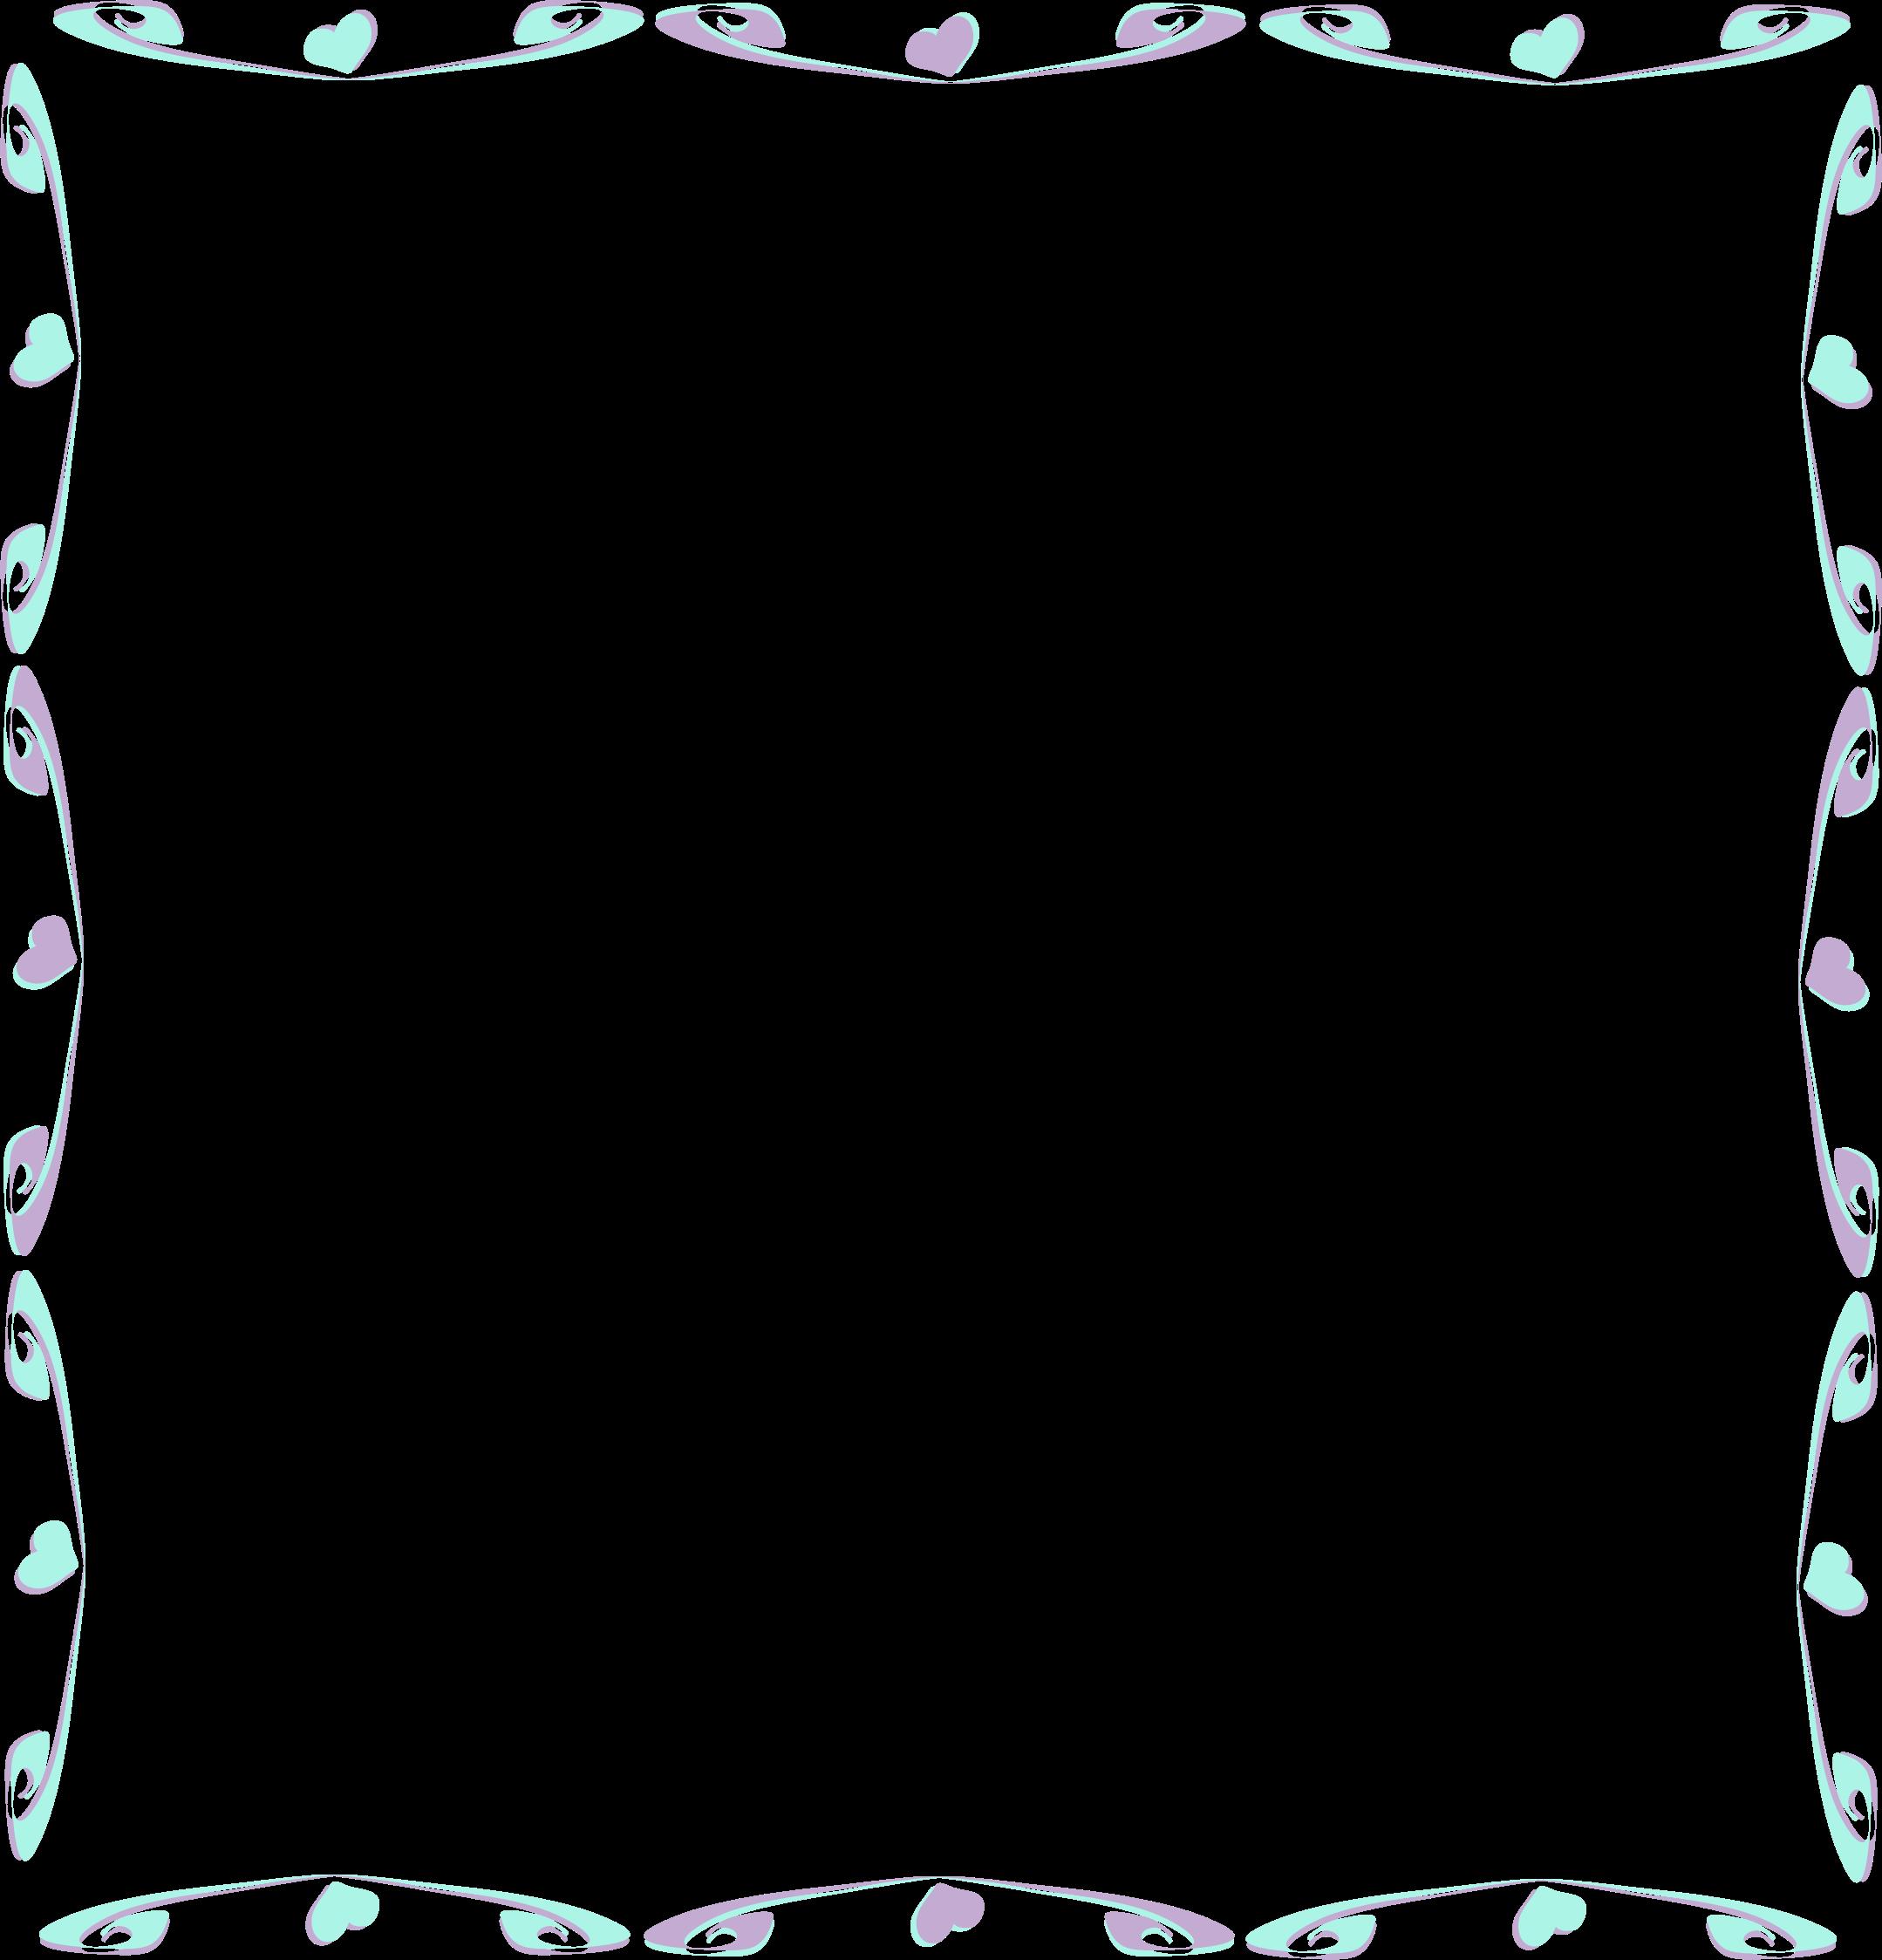 Clipart - Colorful Divider 2 frame